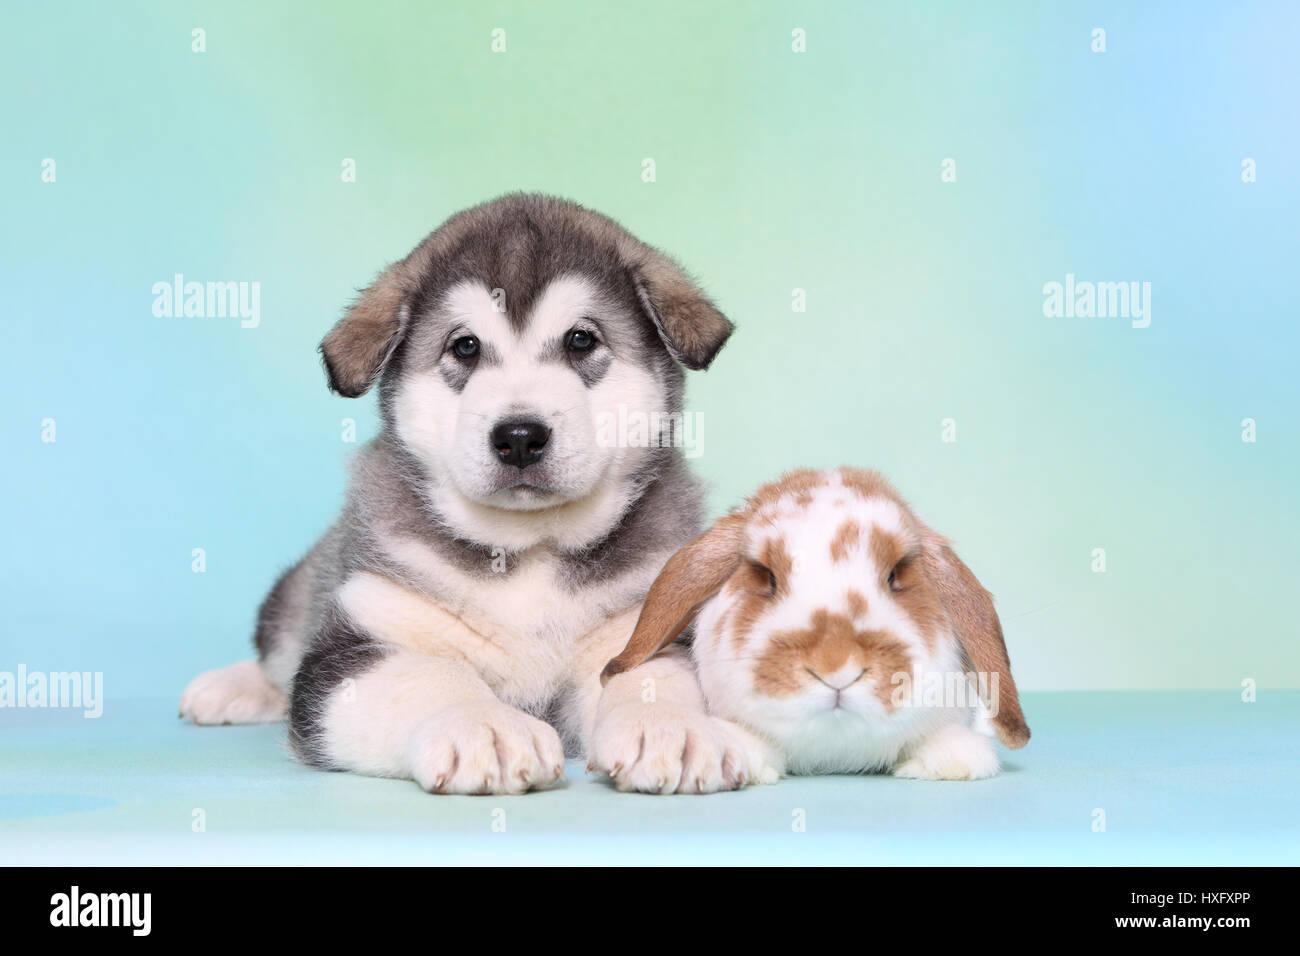 Alaskan Malamute Puppy 6 Weeks Old And Mini Lop Bunny Lying Next